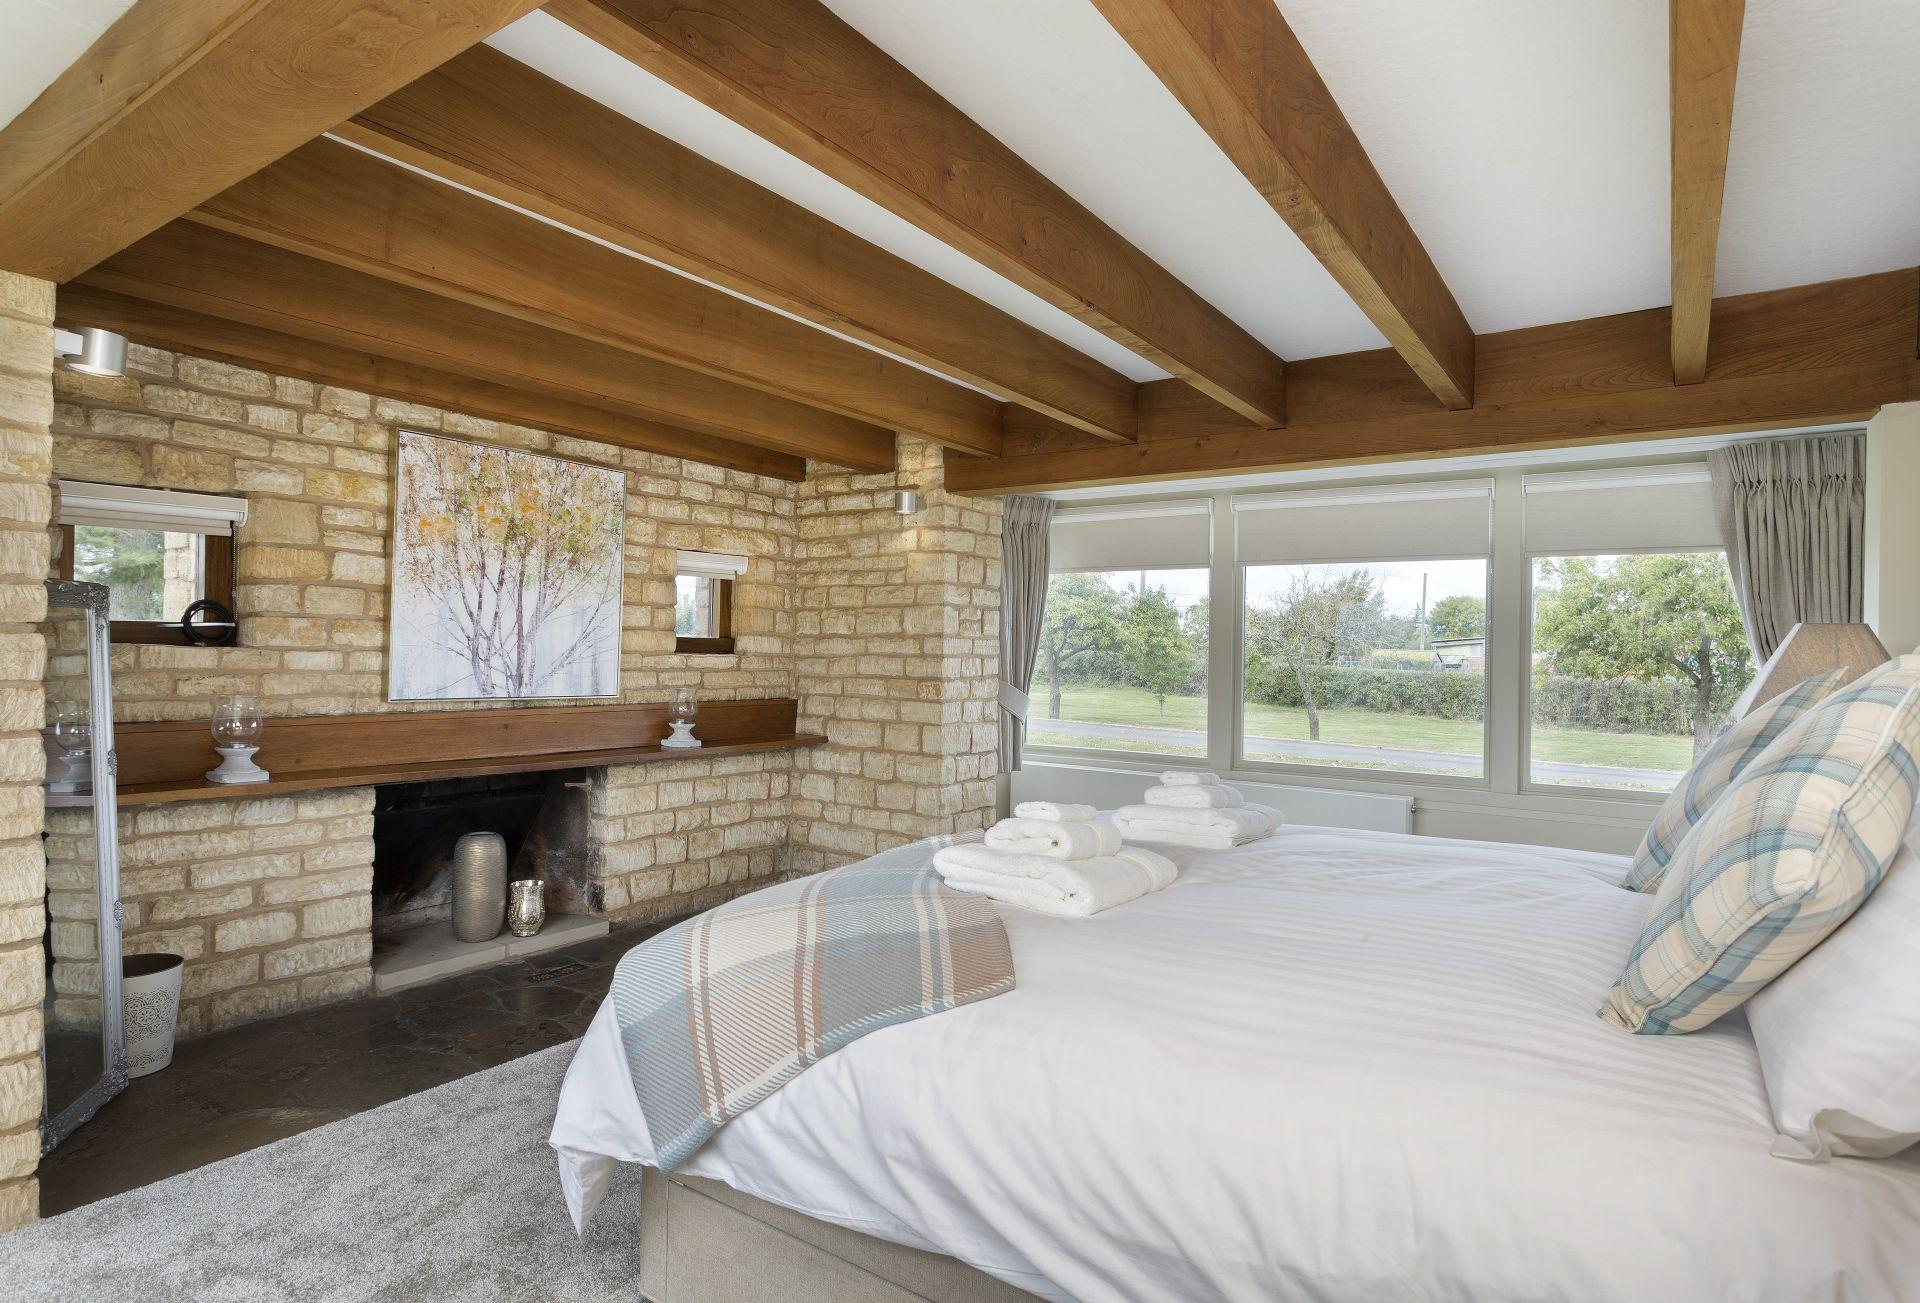 Ground floor: Master bedroom enjoys lovely views onto the garden